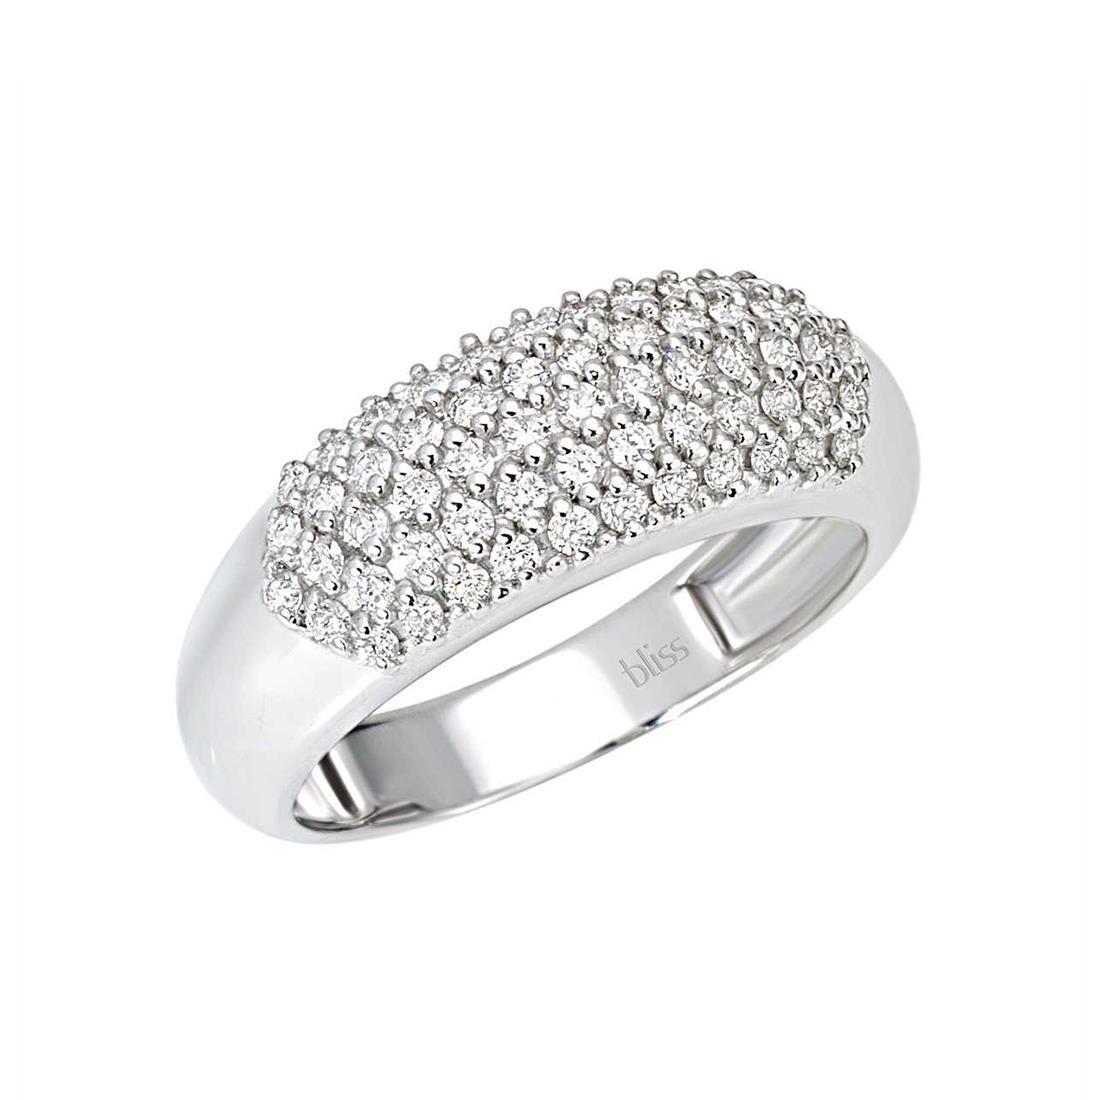 Ring with pavè diamonds  - BLISS